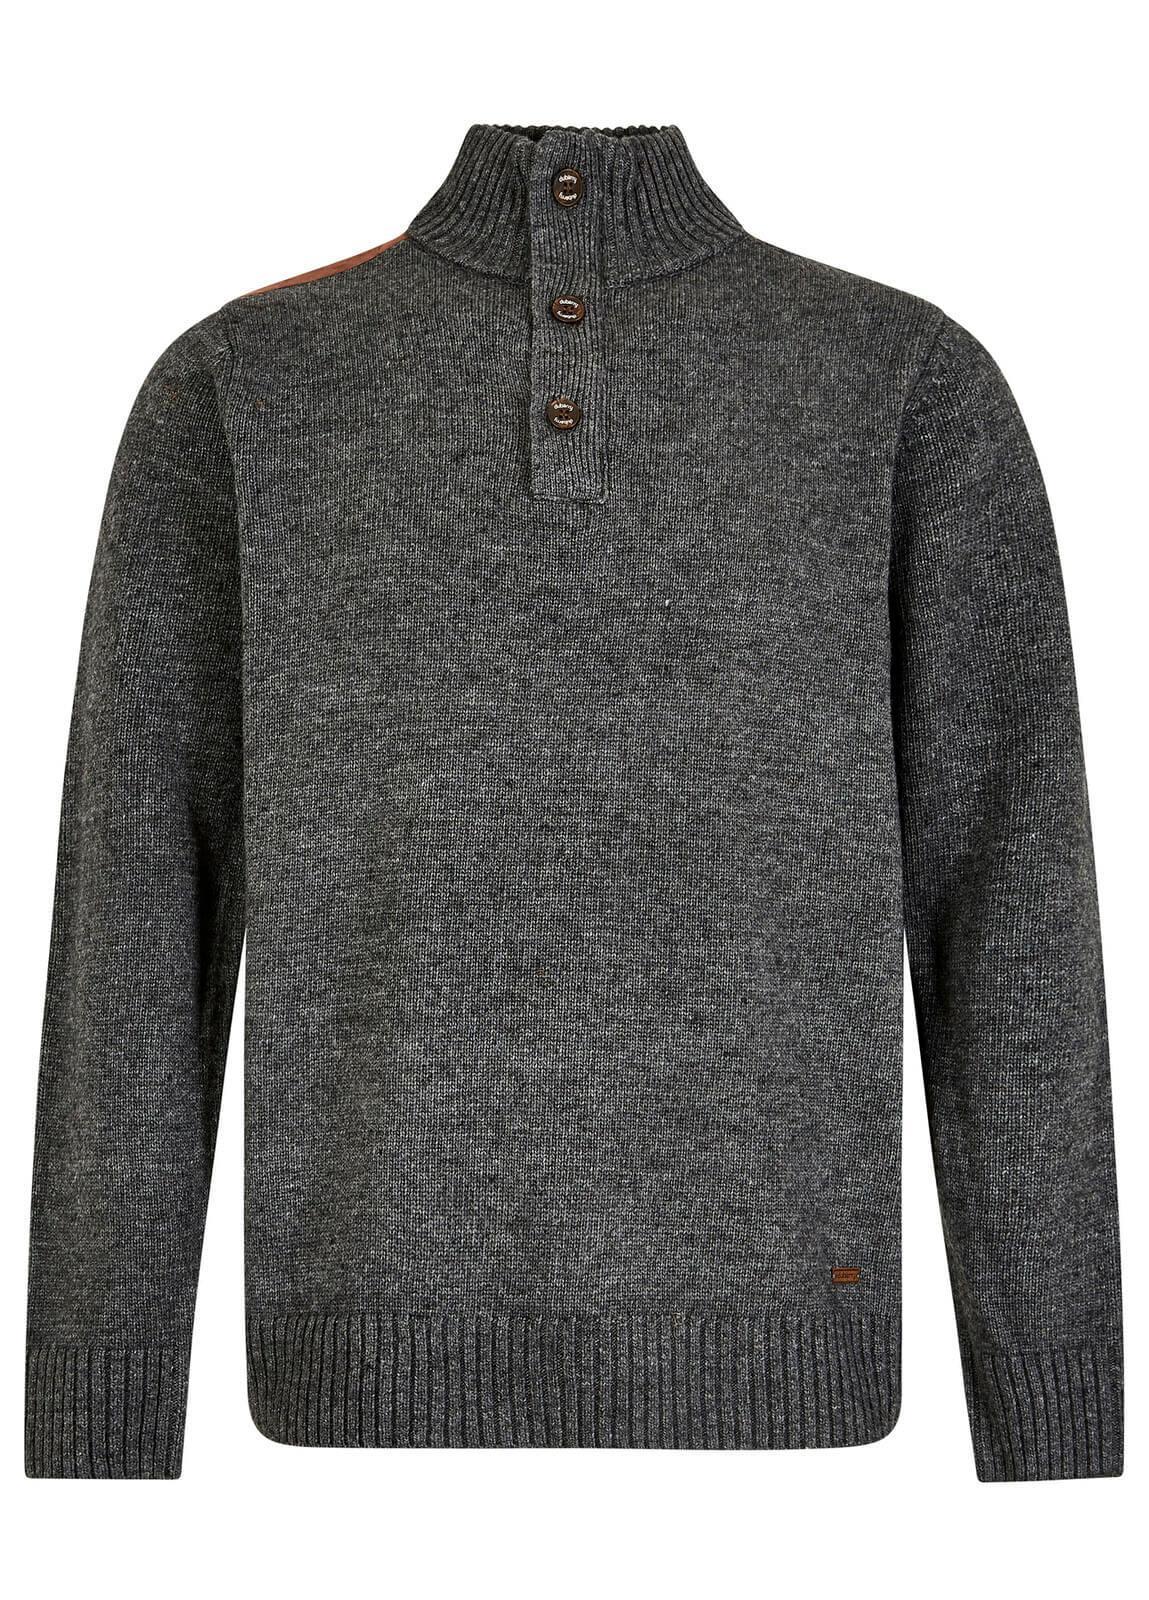 Lambert_Sweater_Light_Grey_Image_1